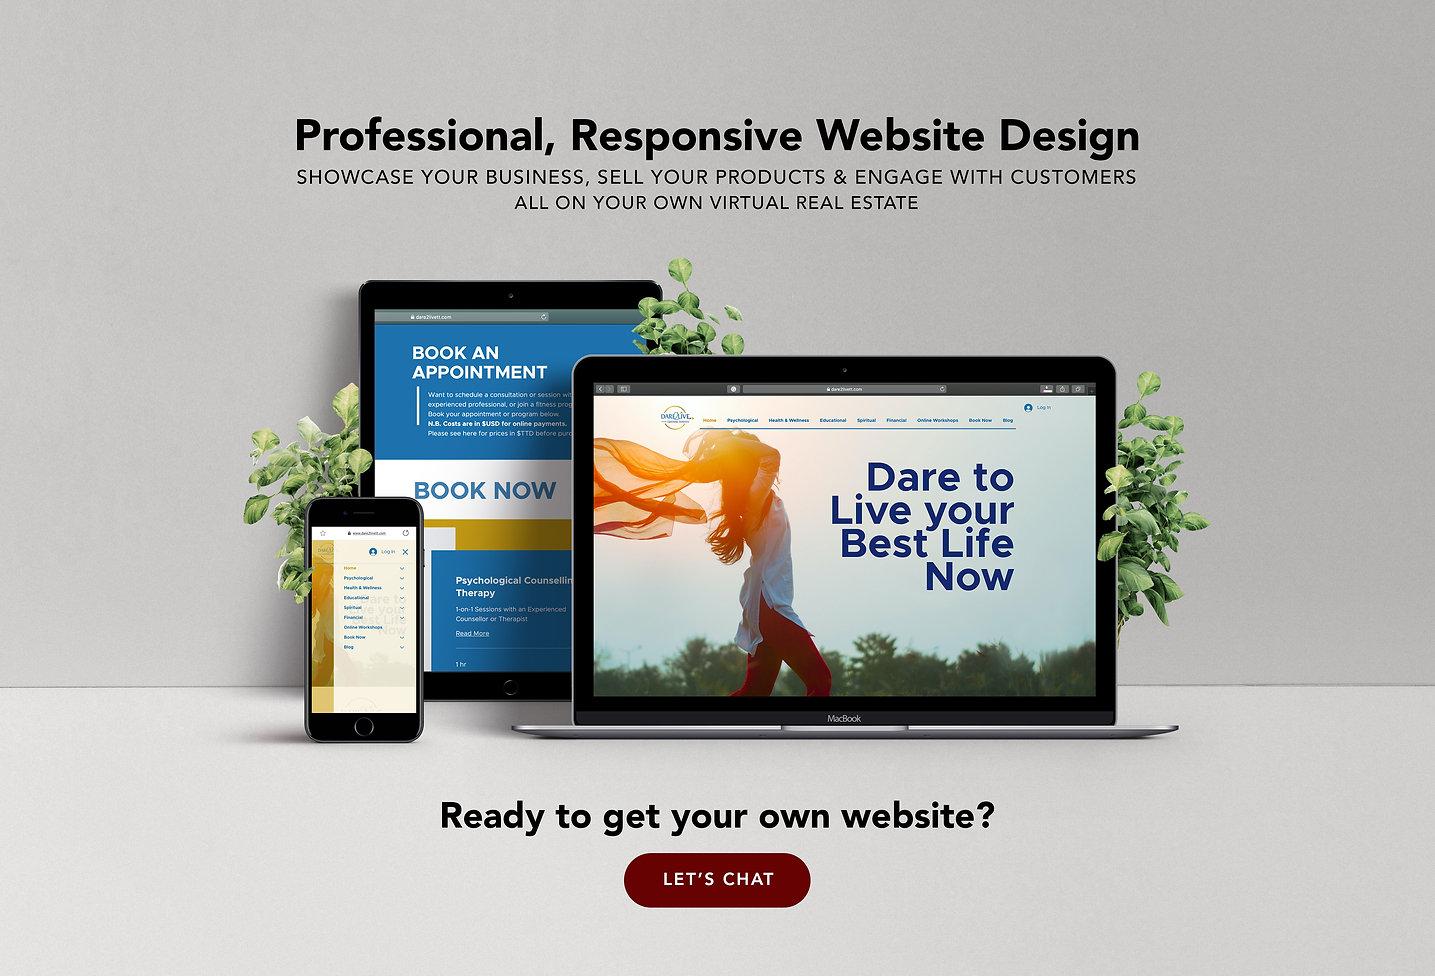 Web Design Ad.jpg